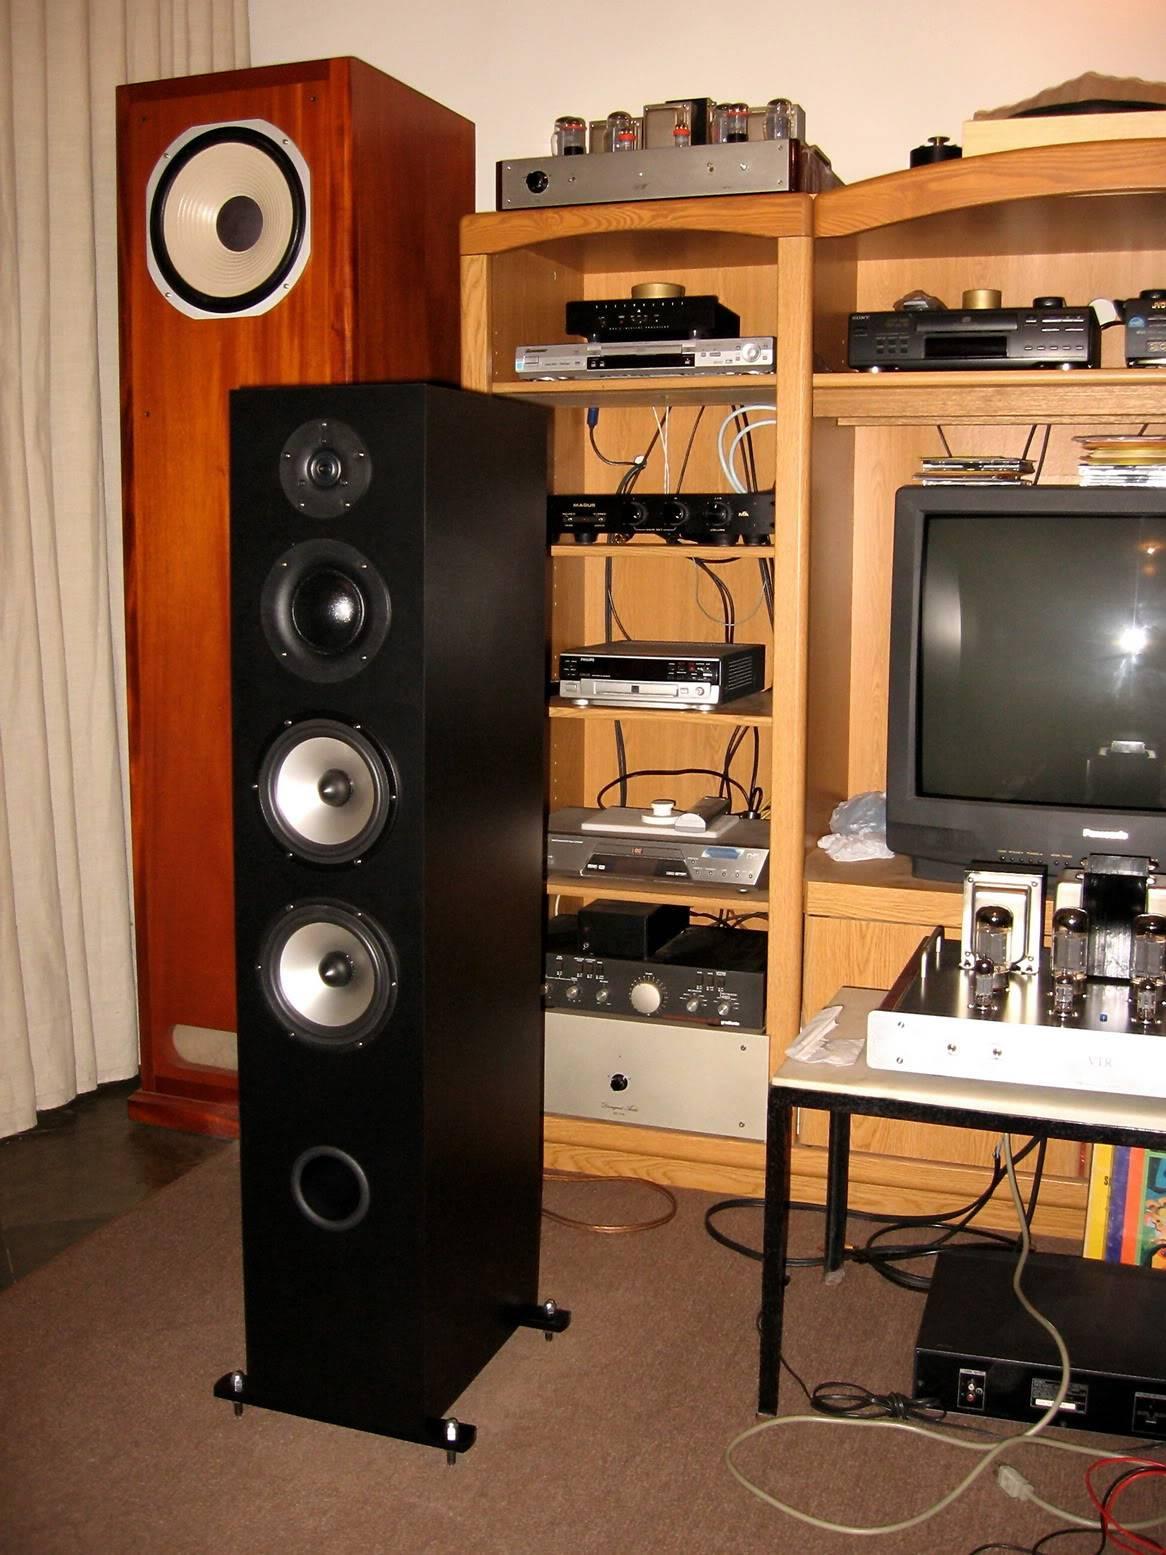 Sonofletores VTR Black Pearl VTR_BlackPearl_01